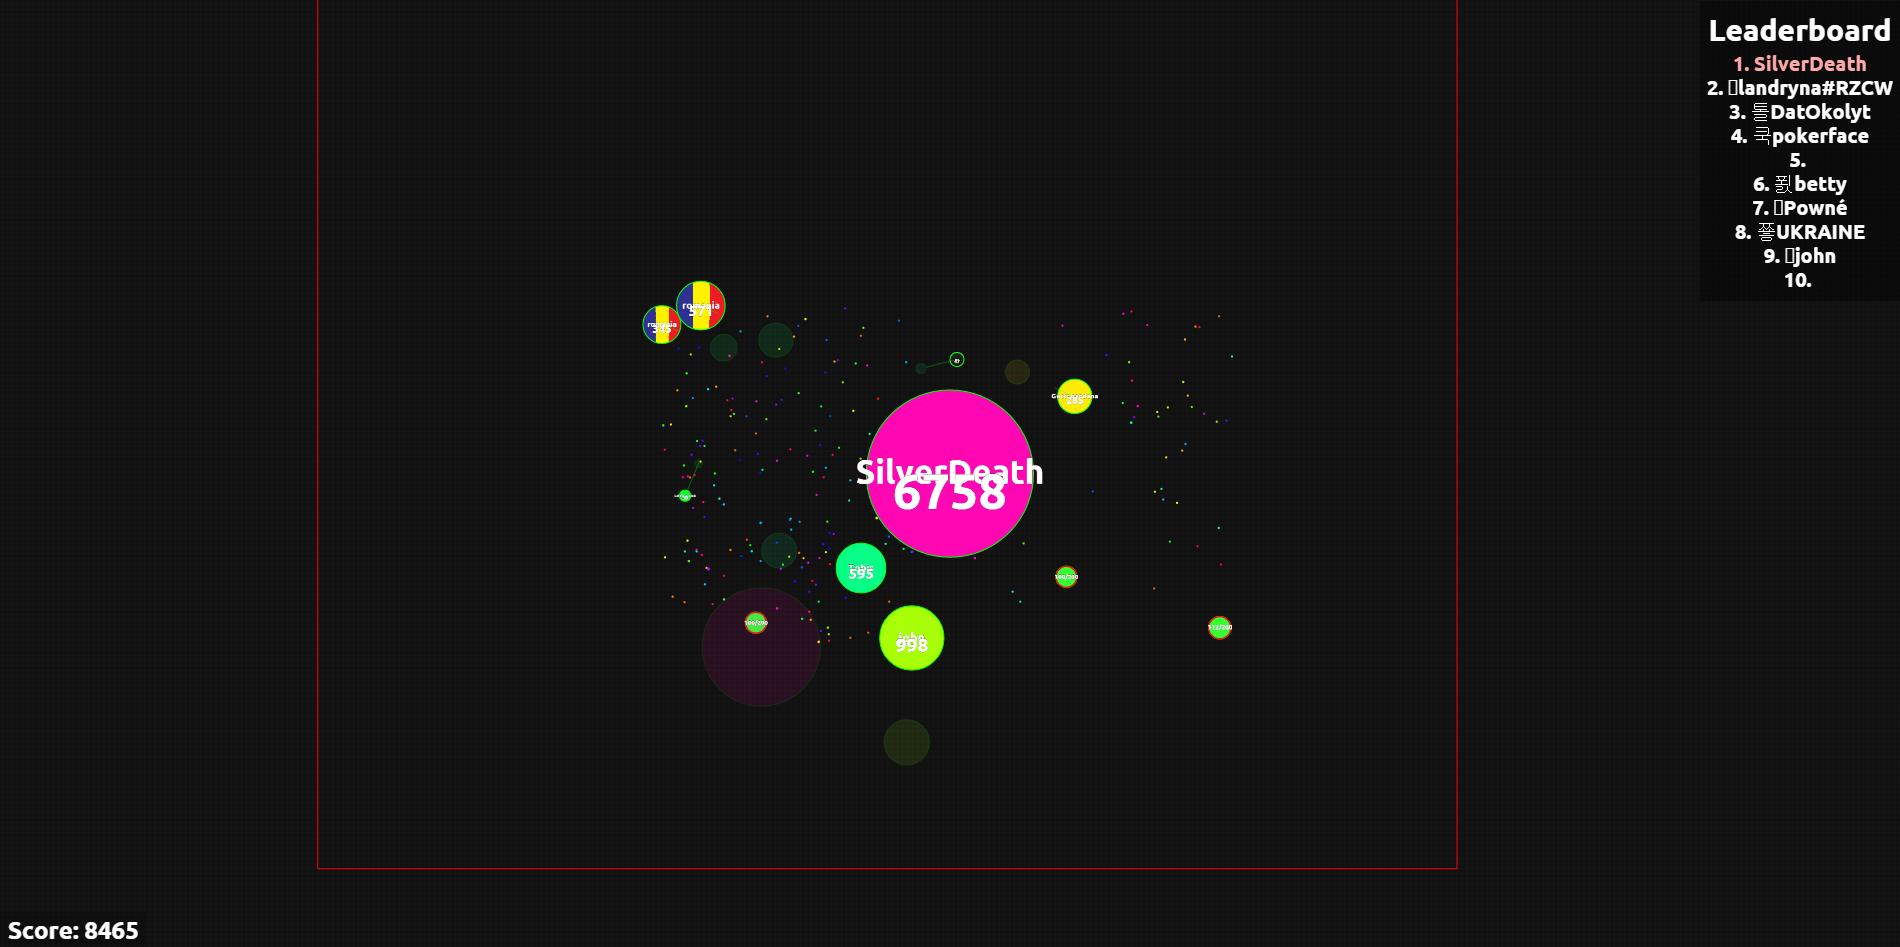 1337 io